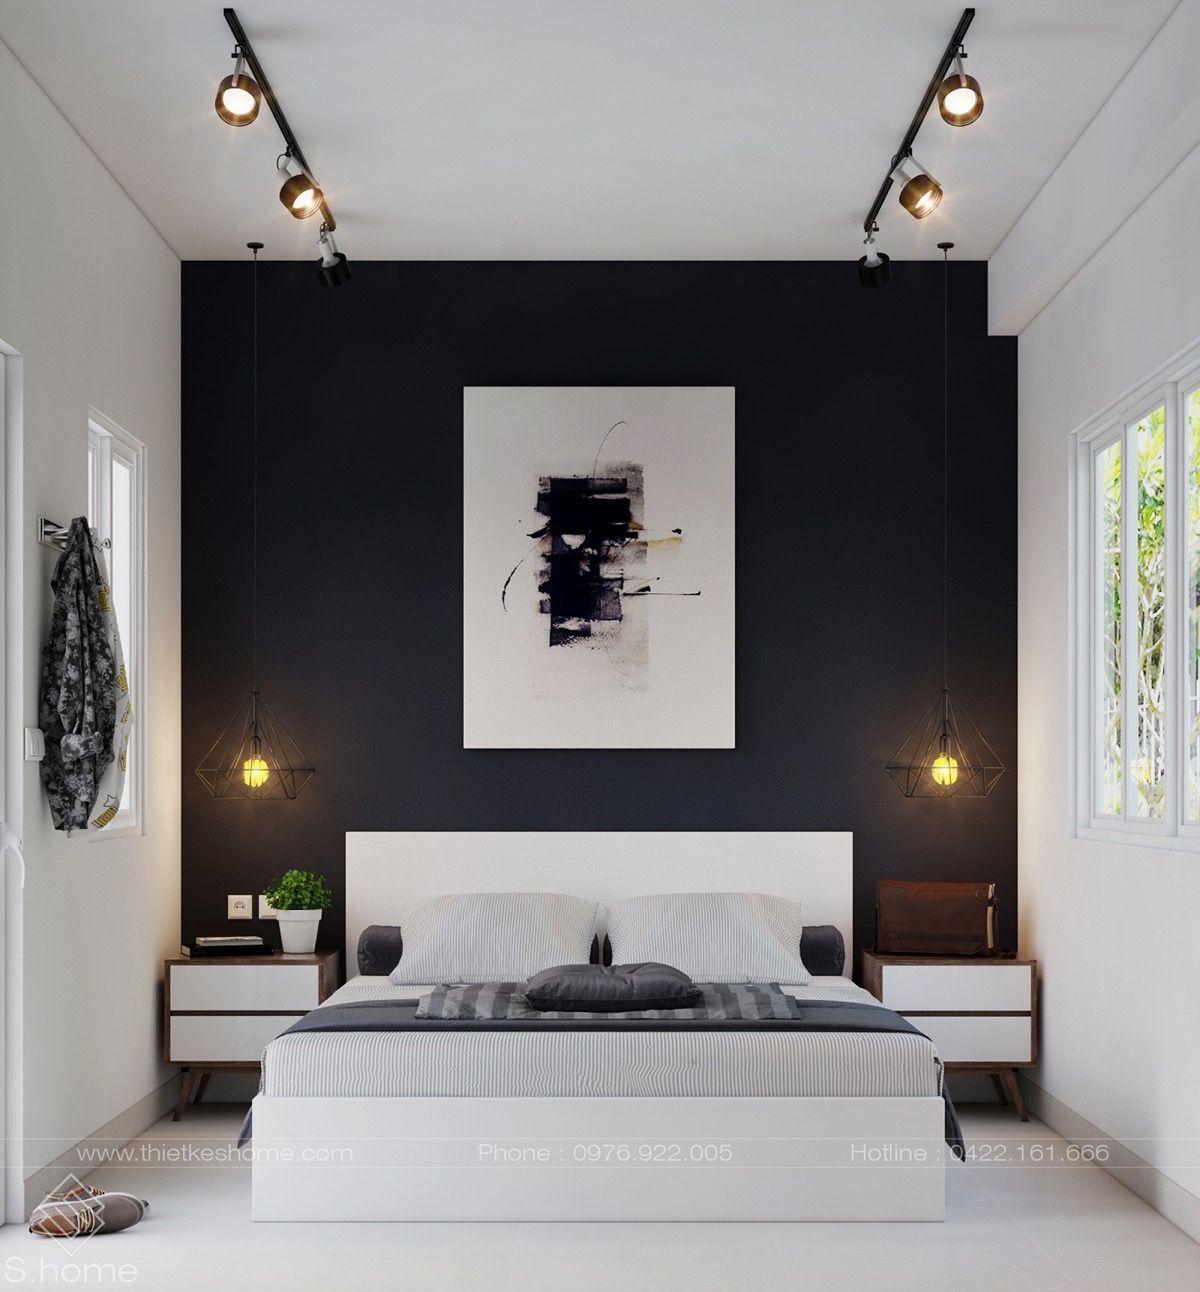 Pin De Verlan En Bedroom Pinterest ~ Diseño De Habitaciones Modernas